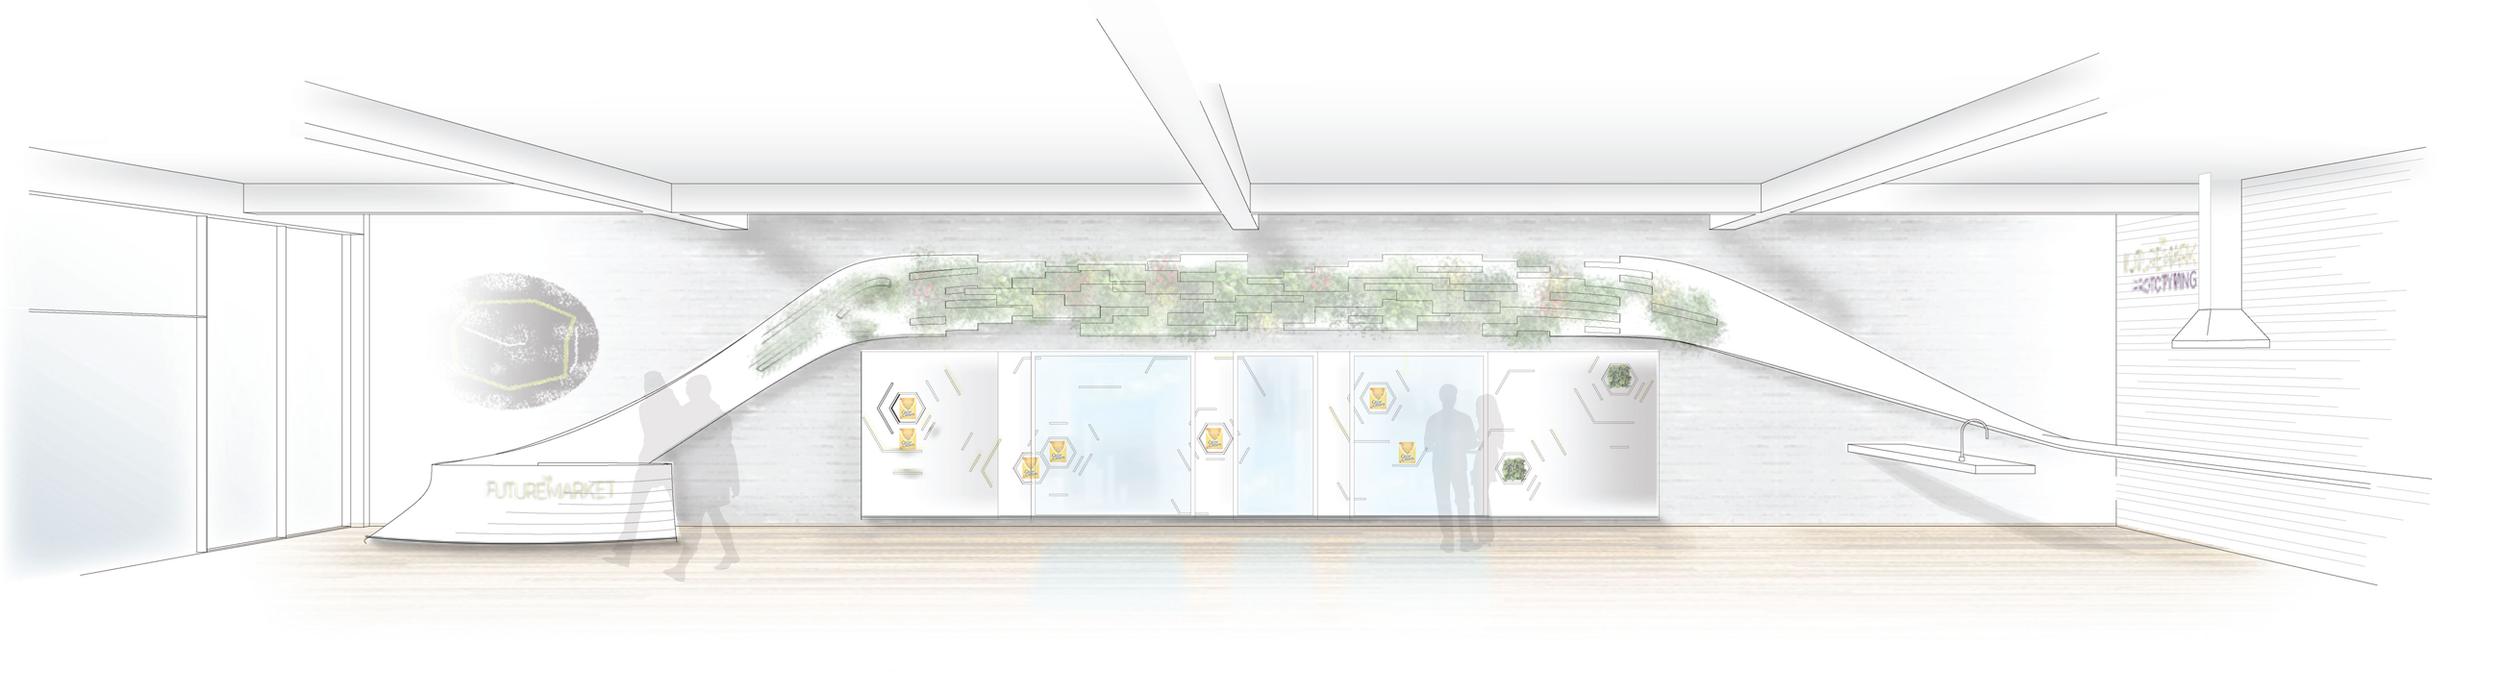 Future Market pop-up store concept rendering.